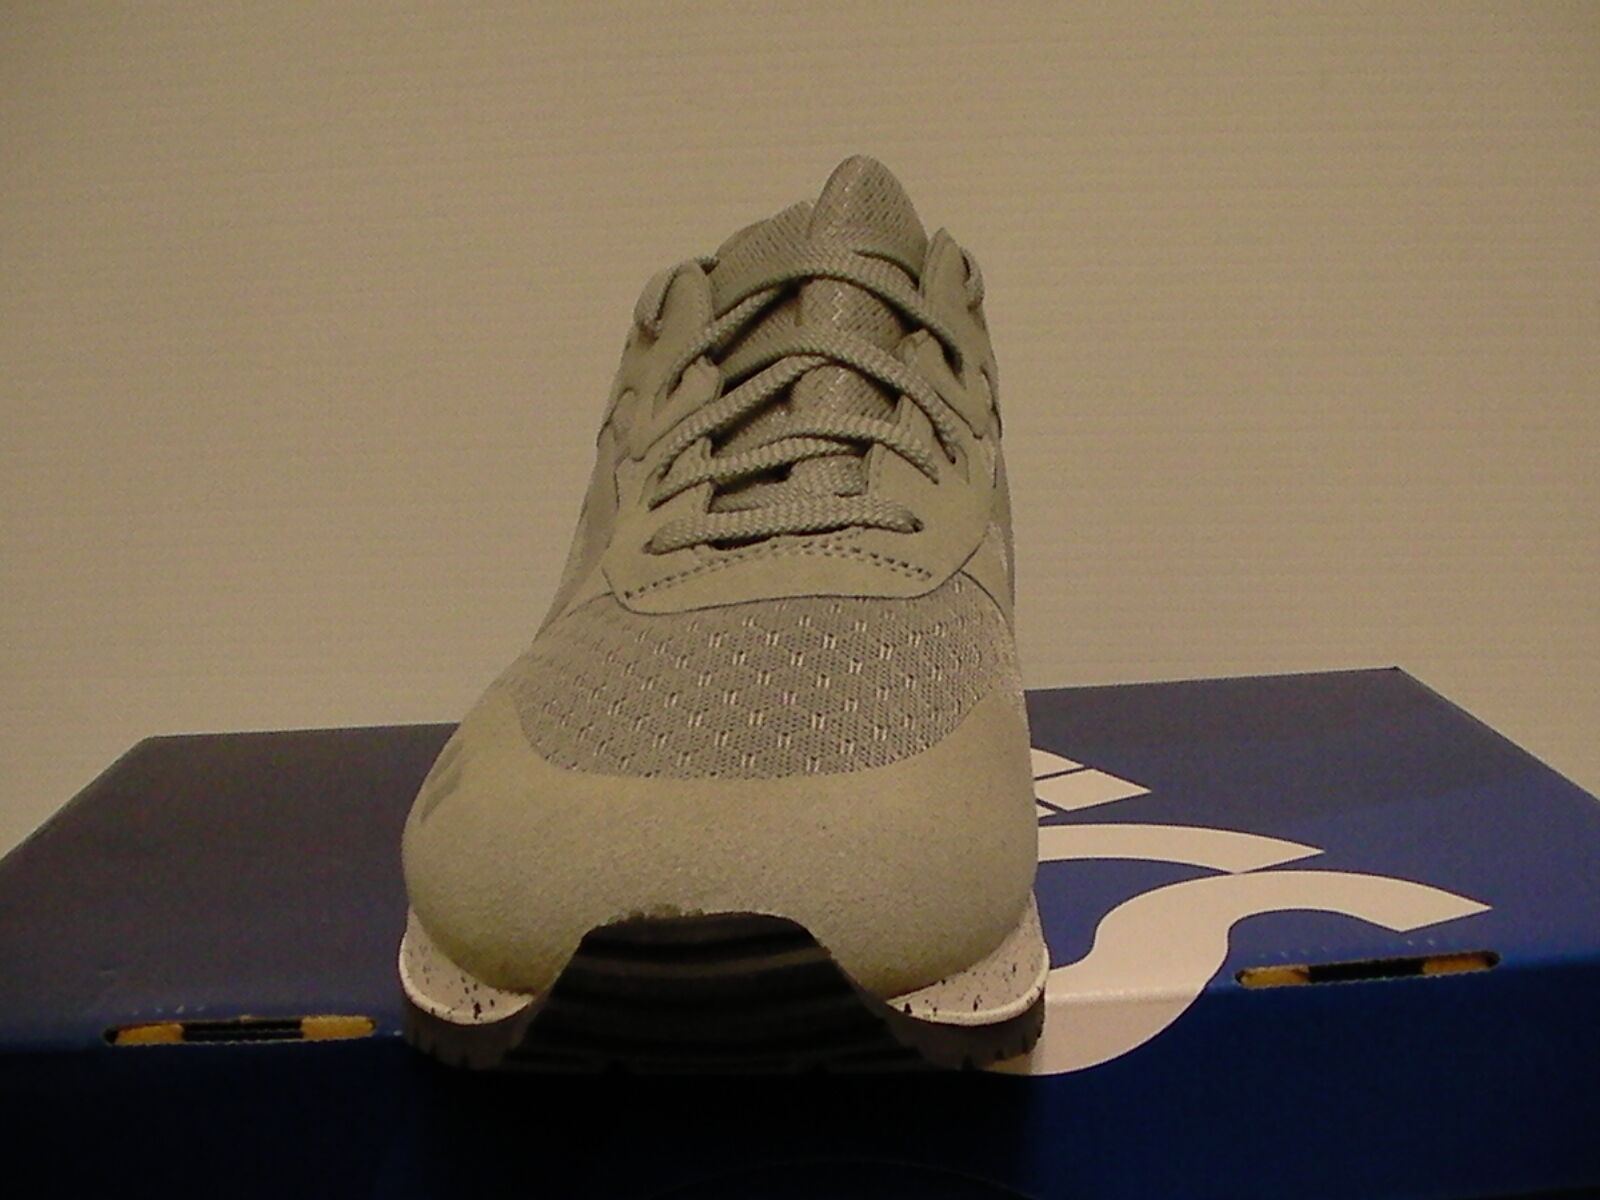 Asics running running running shoes gel-lyte iii size 7.5 us men light grey new with box cc42d6